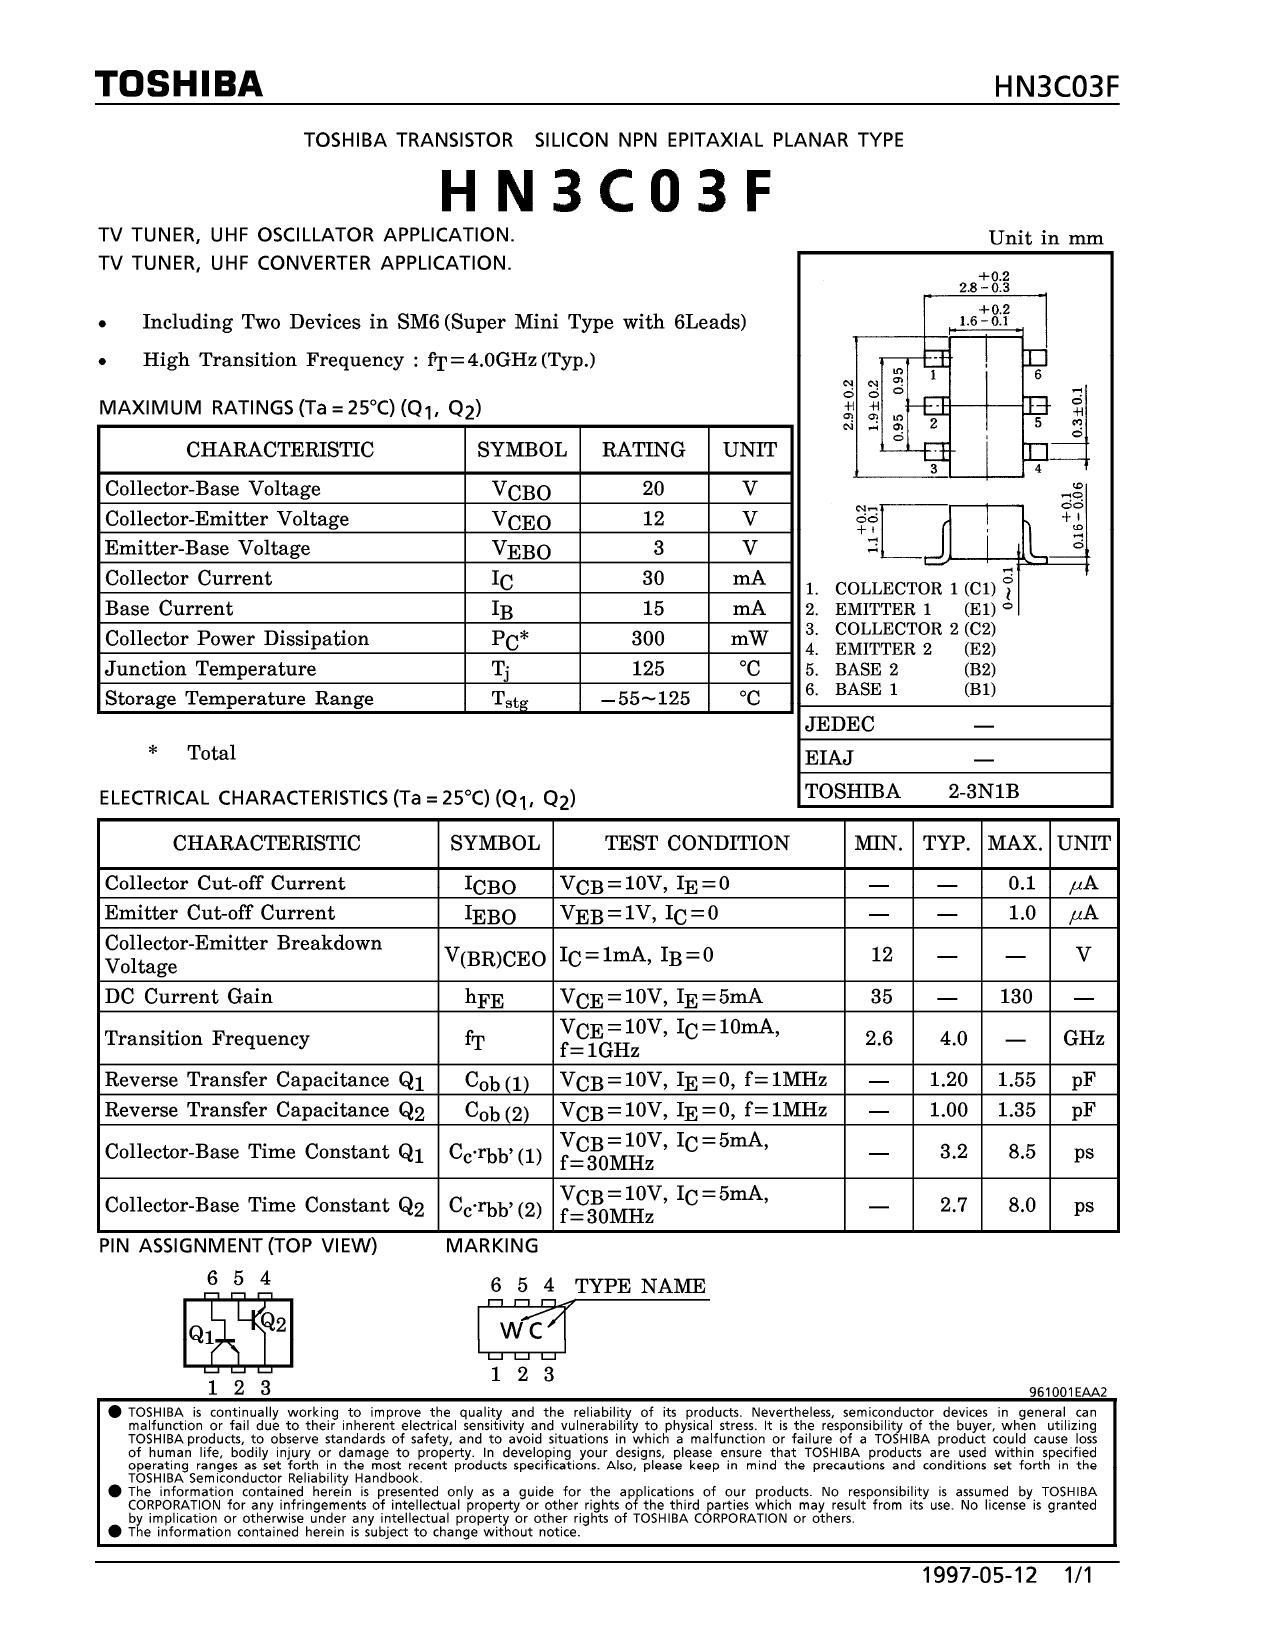 hn3c03f datasheet pdf   pinout     uhf oscillator